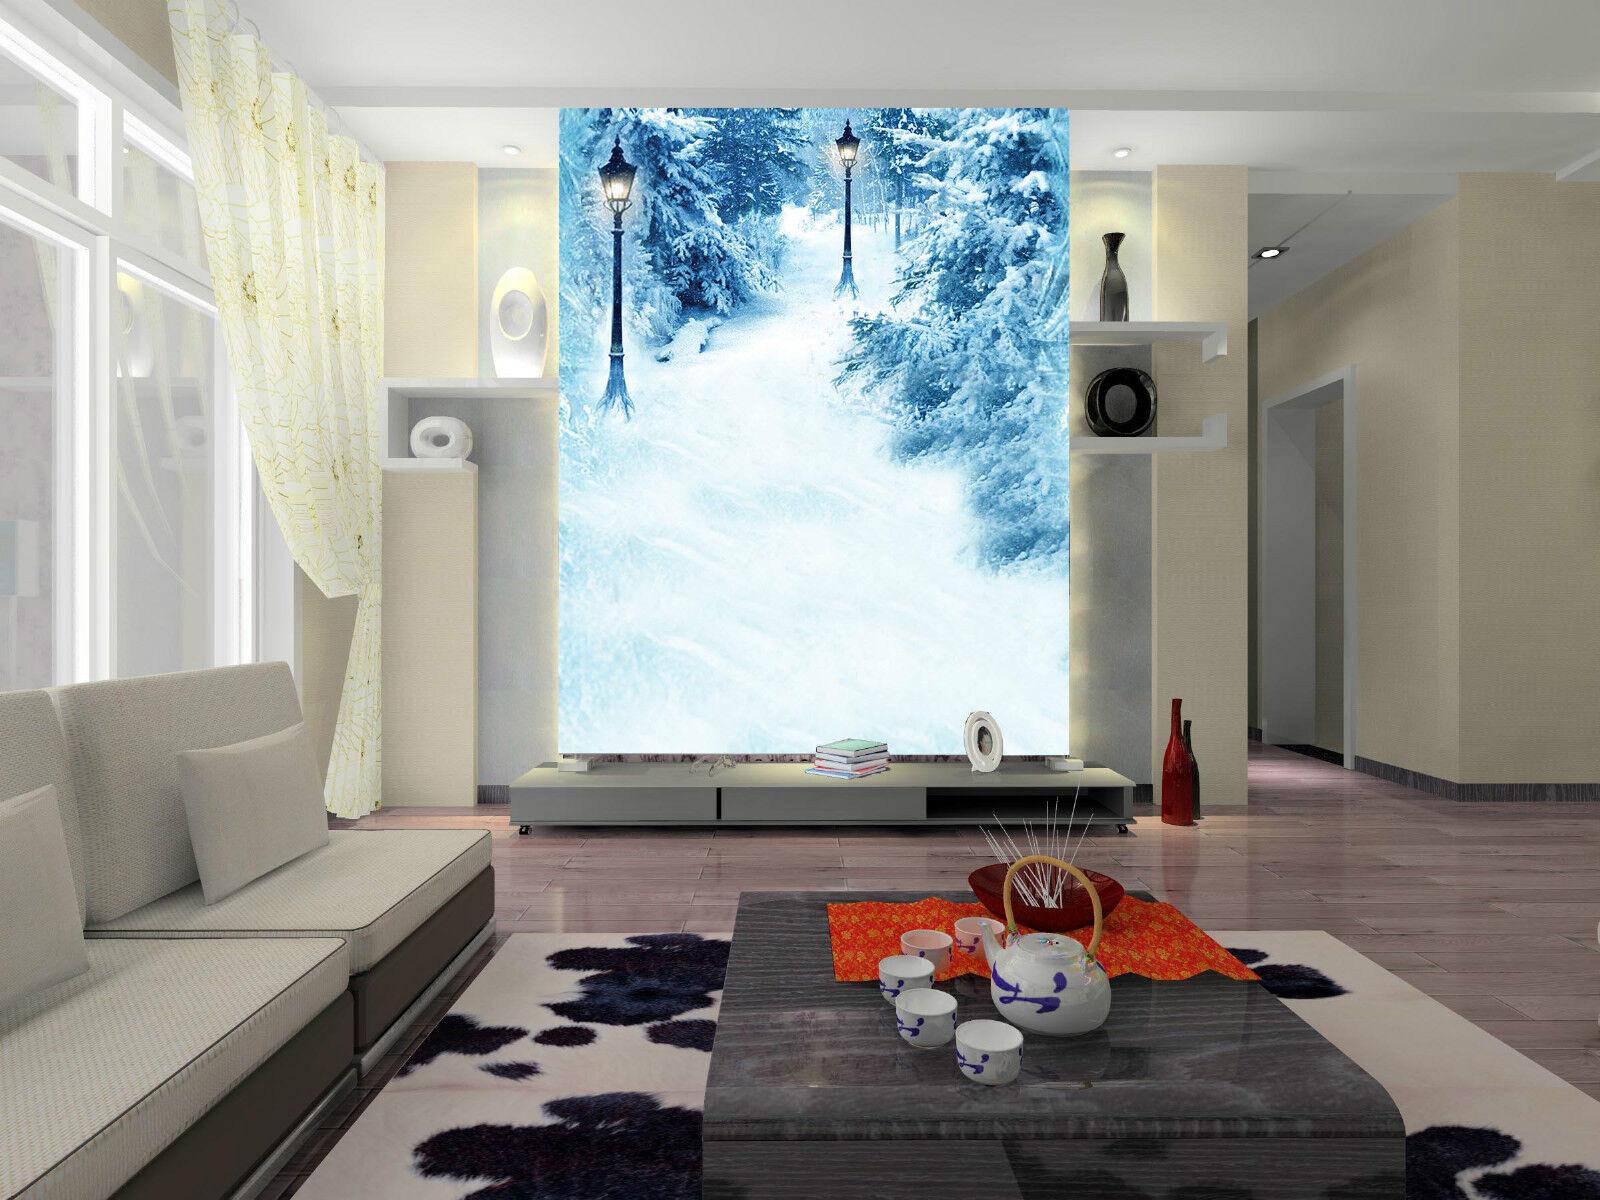 3D Straßenlaterne im schnee31 Fototapeten Wandbild Fototapete BildTapete Familie